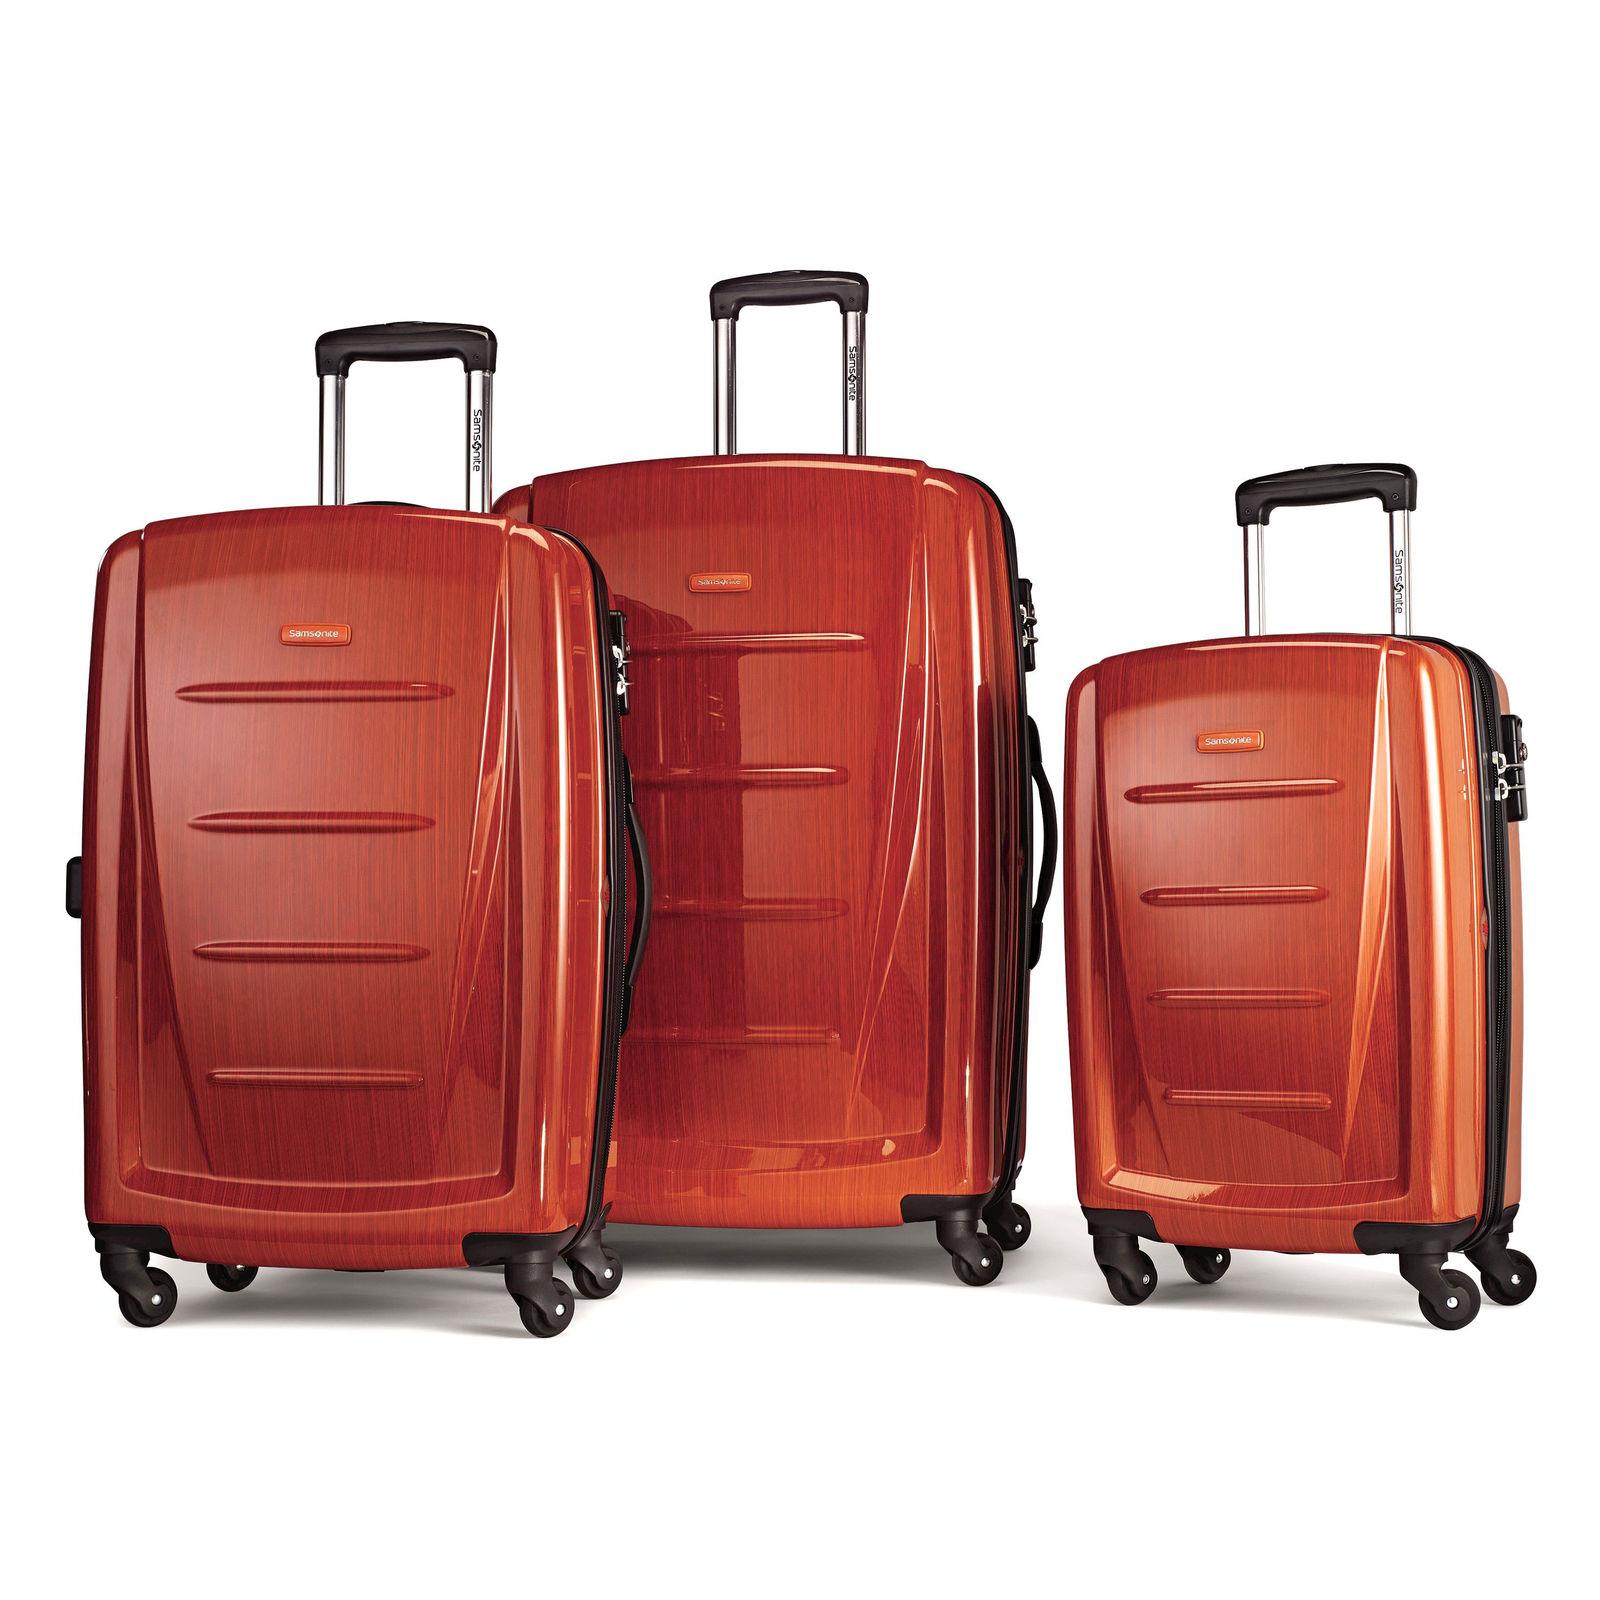 Samsonite Winfield 2 3-piece luggage set Orange $159.99